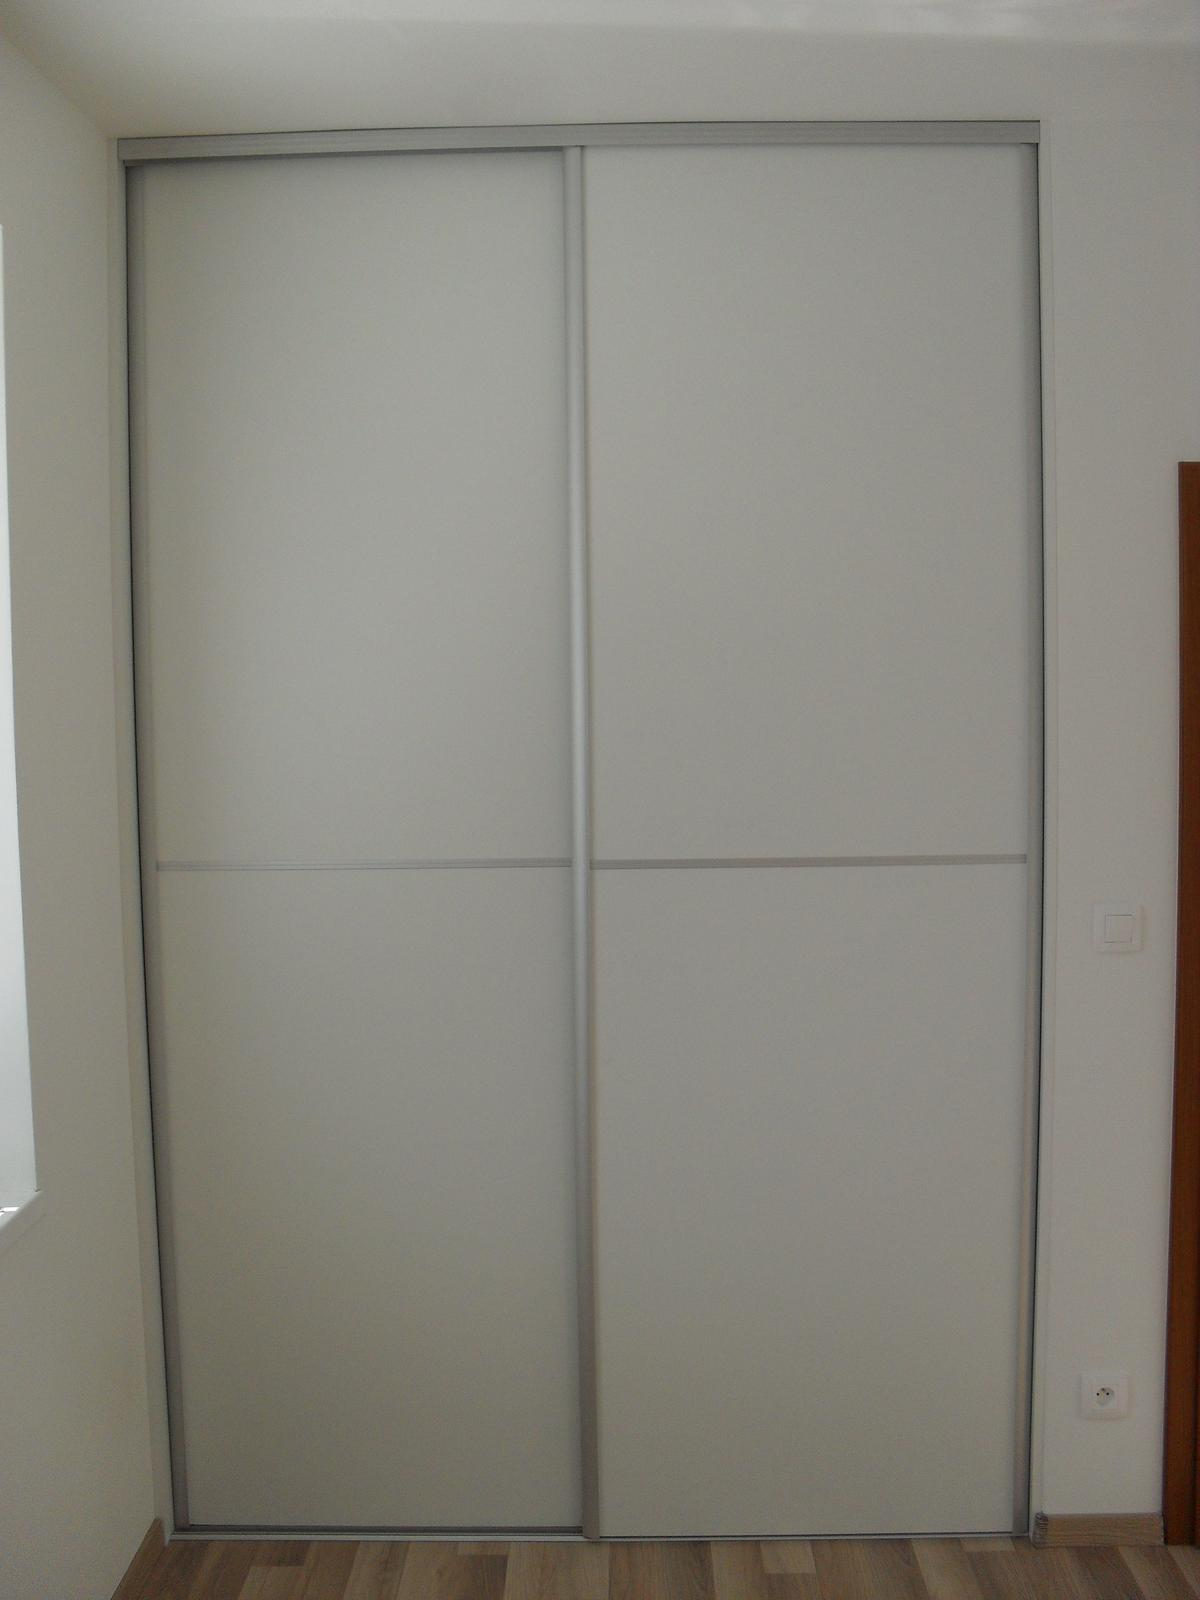 Vstavané skrine Martin Benko Bošany - Obrázok č. 32